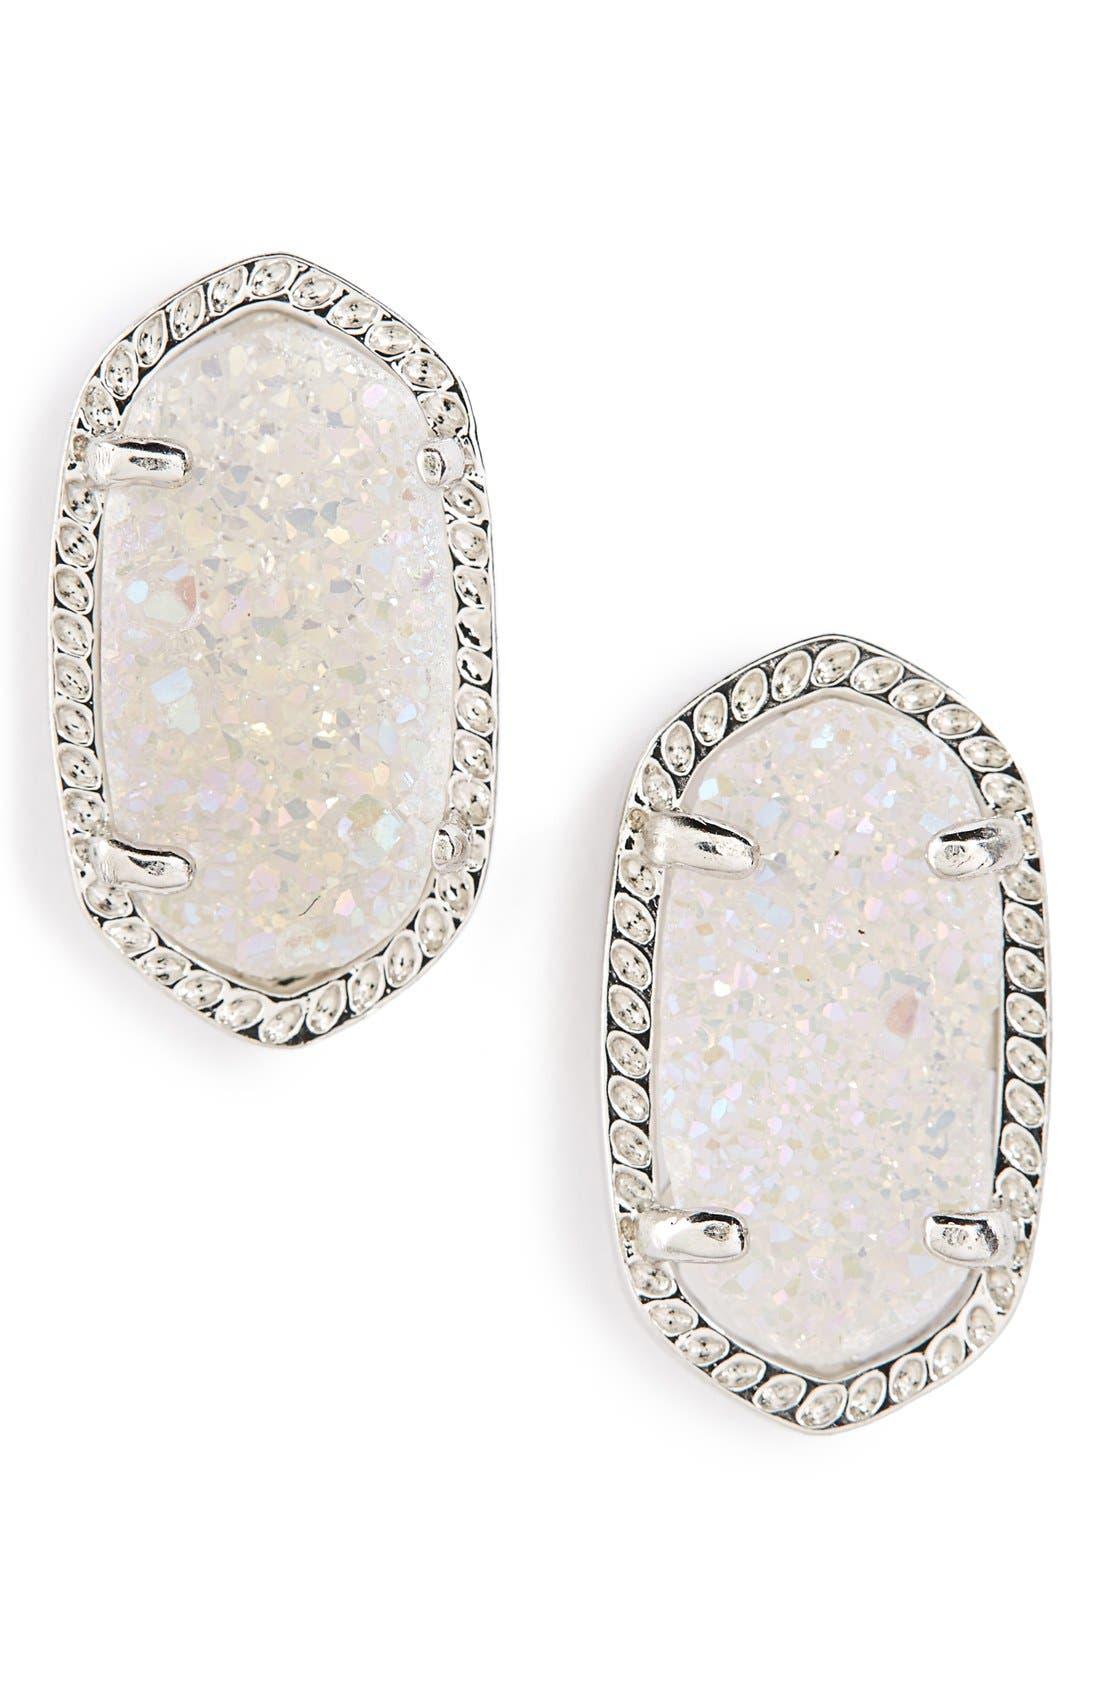 Main Image - Kendra Scott Ellie Oval Stone Stud Earrings